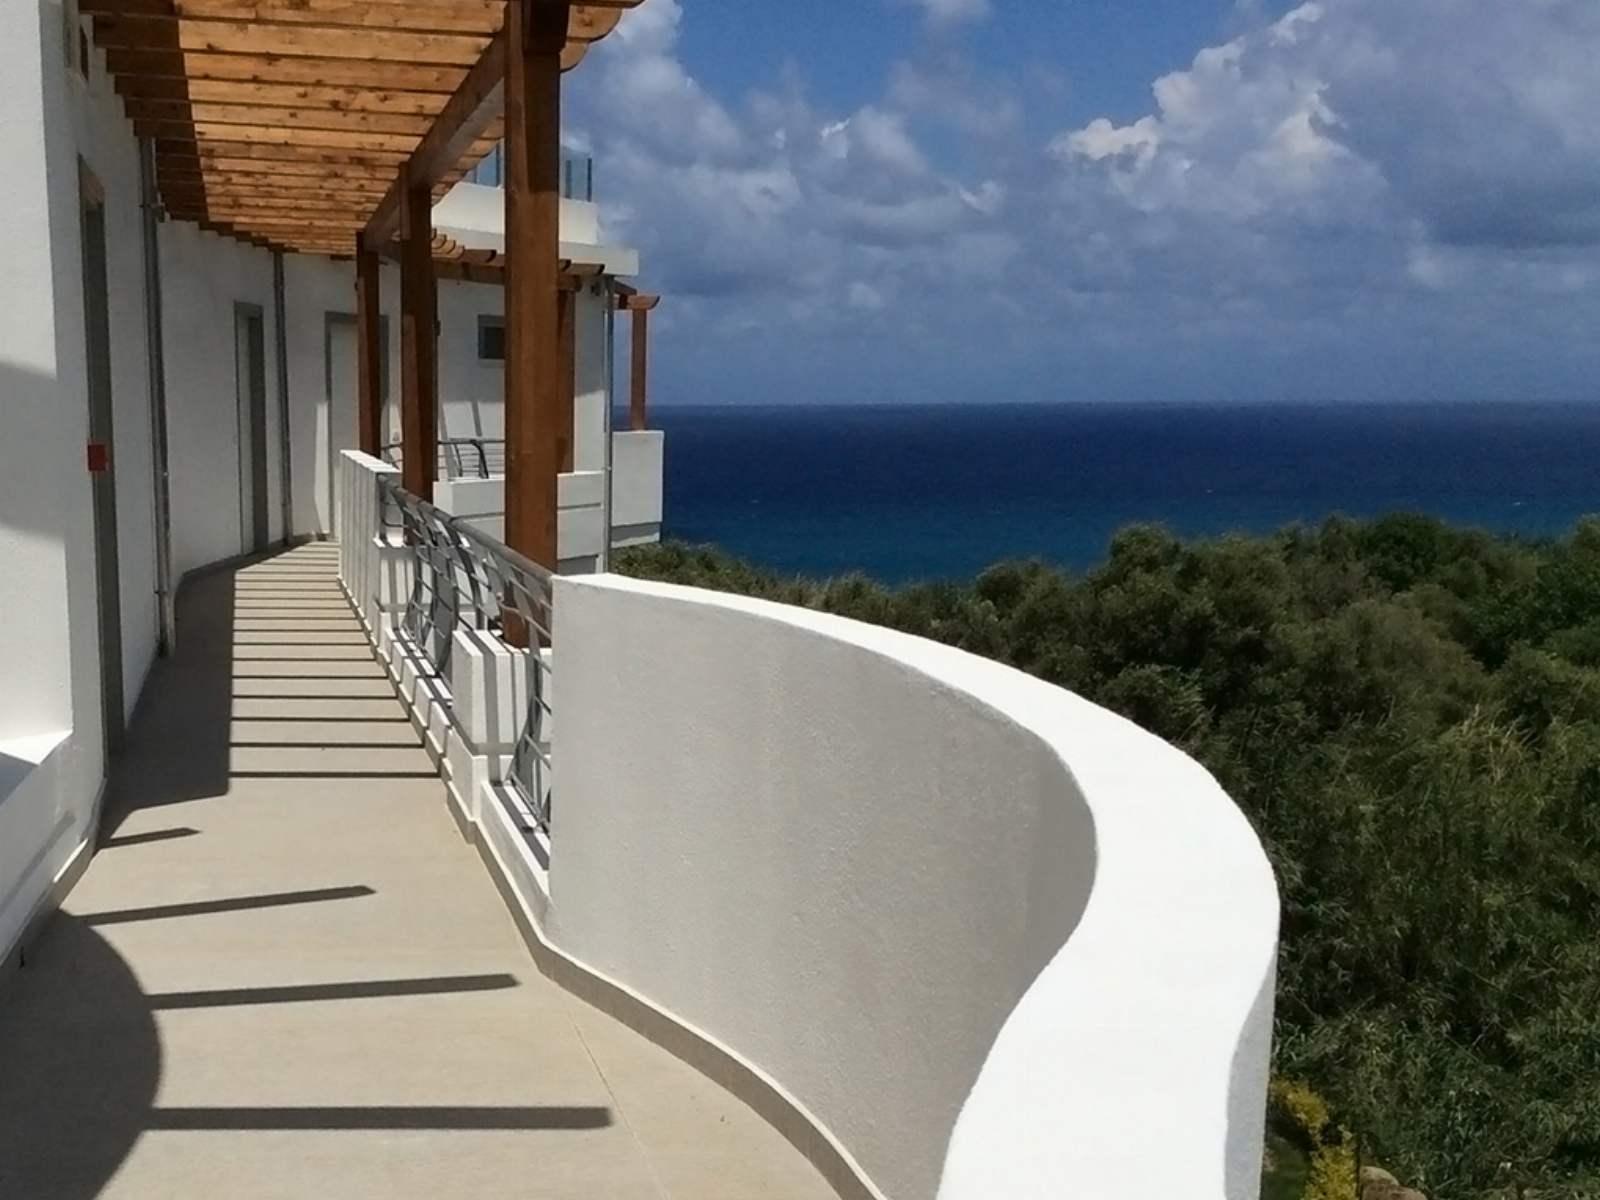 Infinity Resort & Spa: room / property / locale photo. Image 7